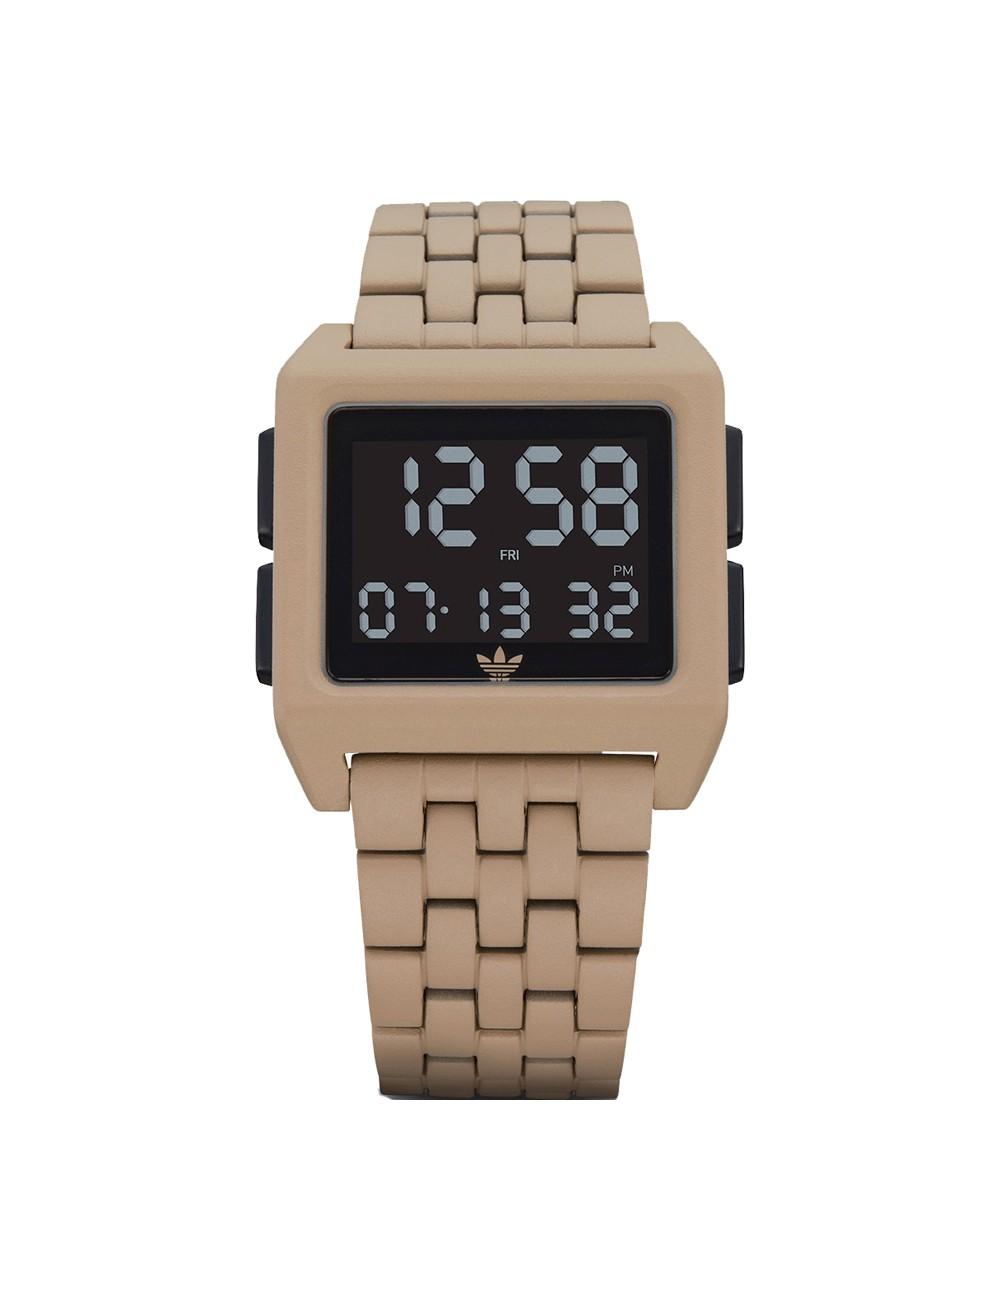 Adidas Archive CM1 Z073068 Mens Watch Chronograph